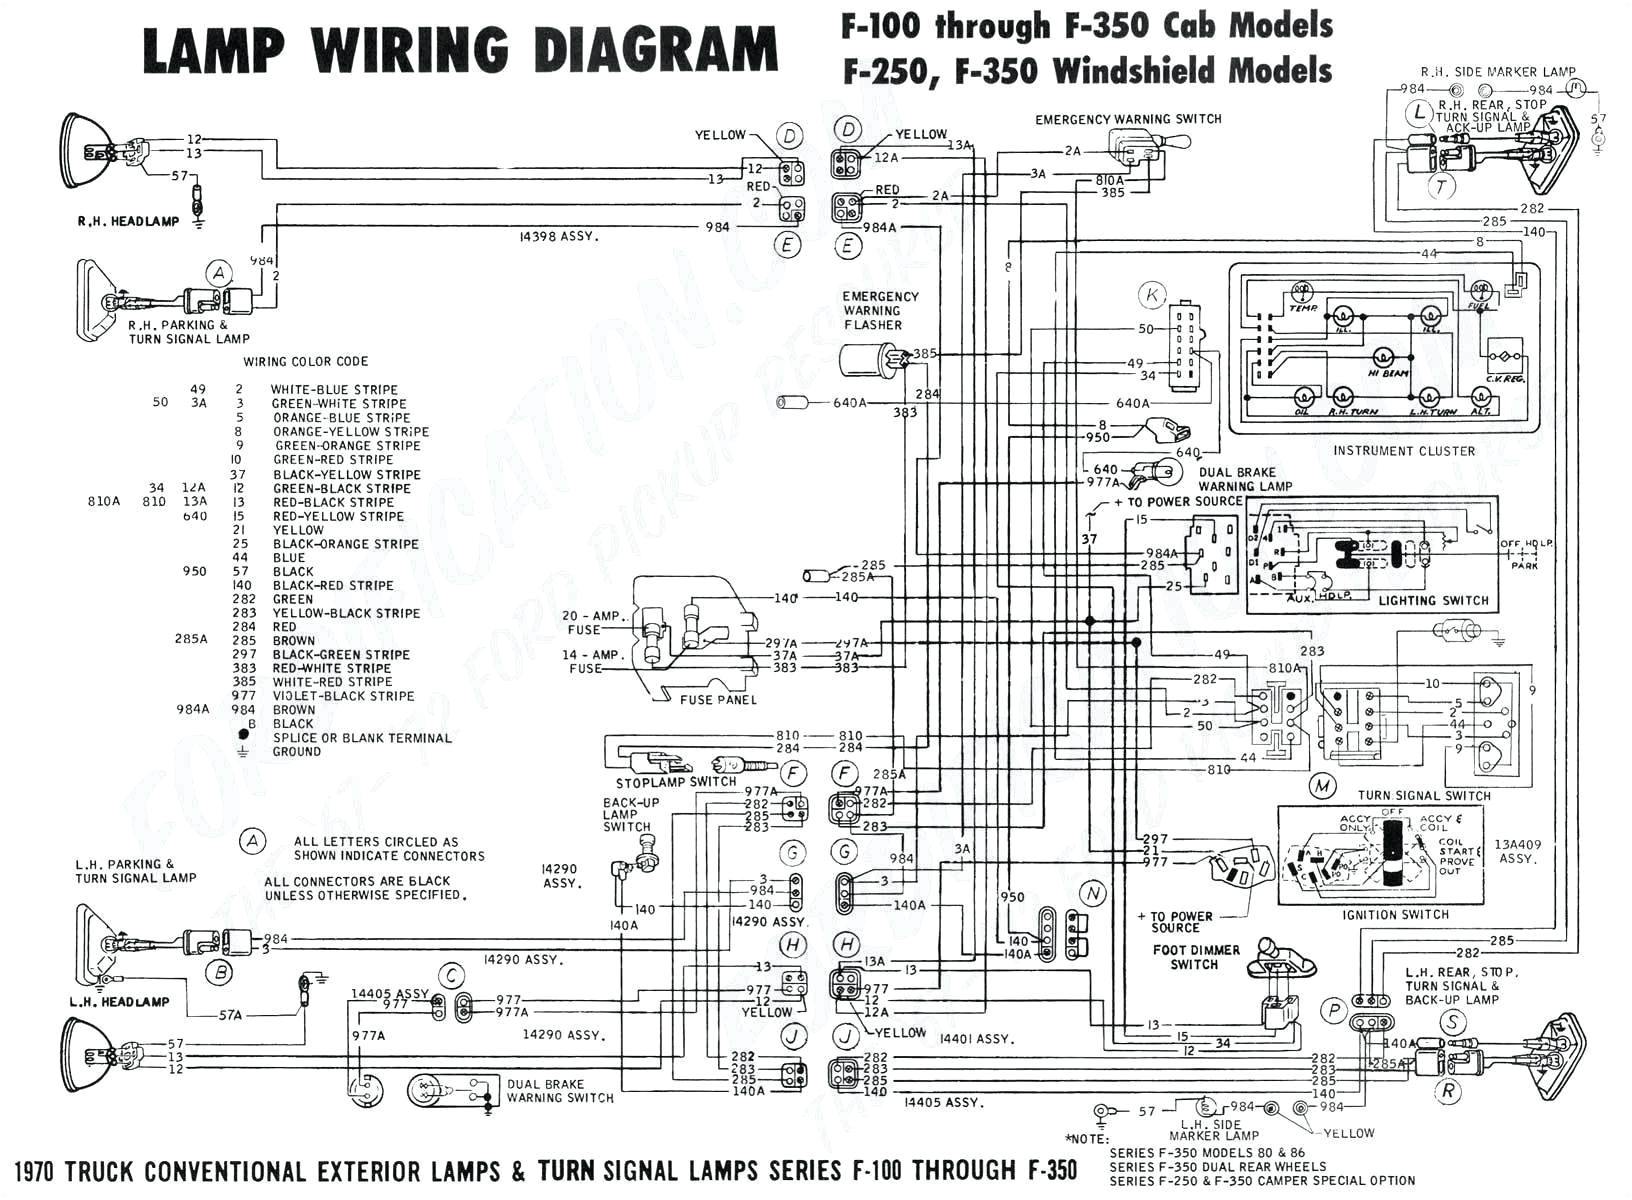 86 isuzu pup wiring diagram blog wiring diagram isuzu pup wiring diagram wiring diagram 1991 isuzu